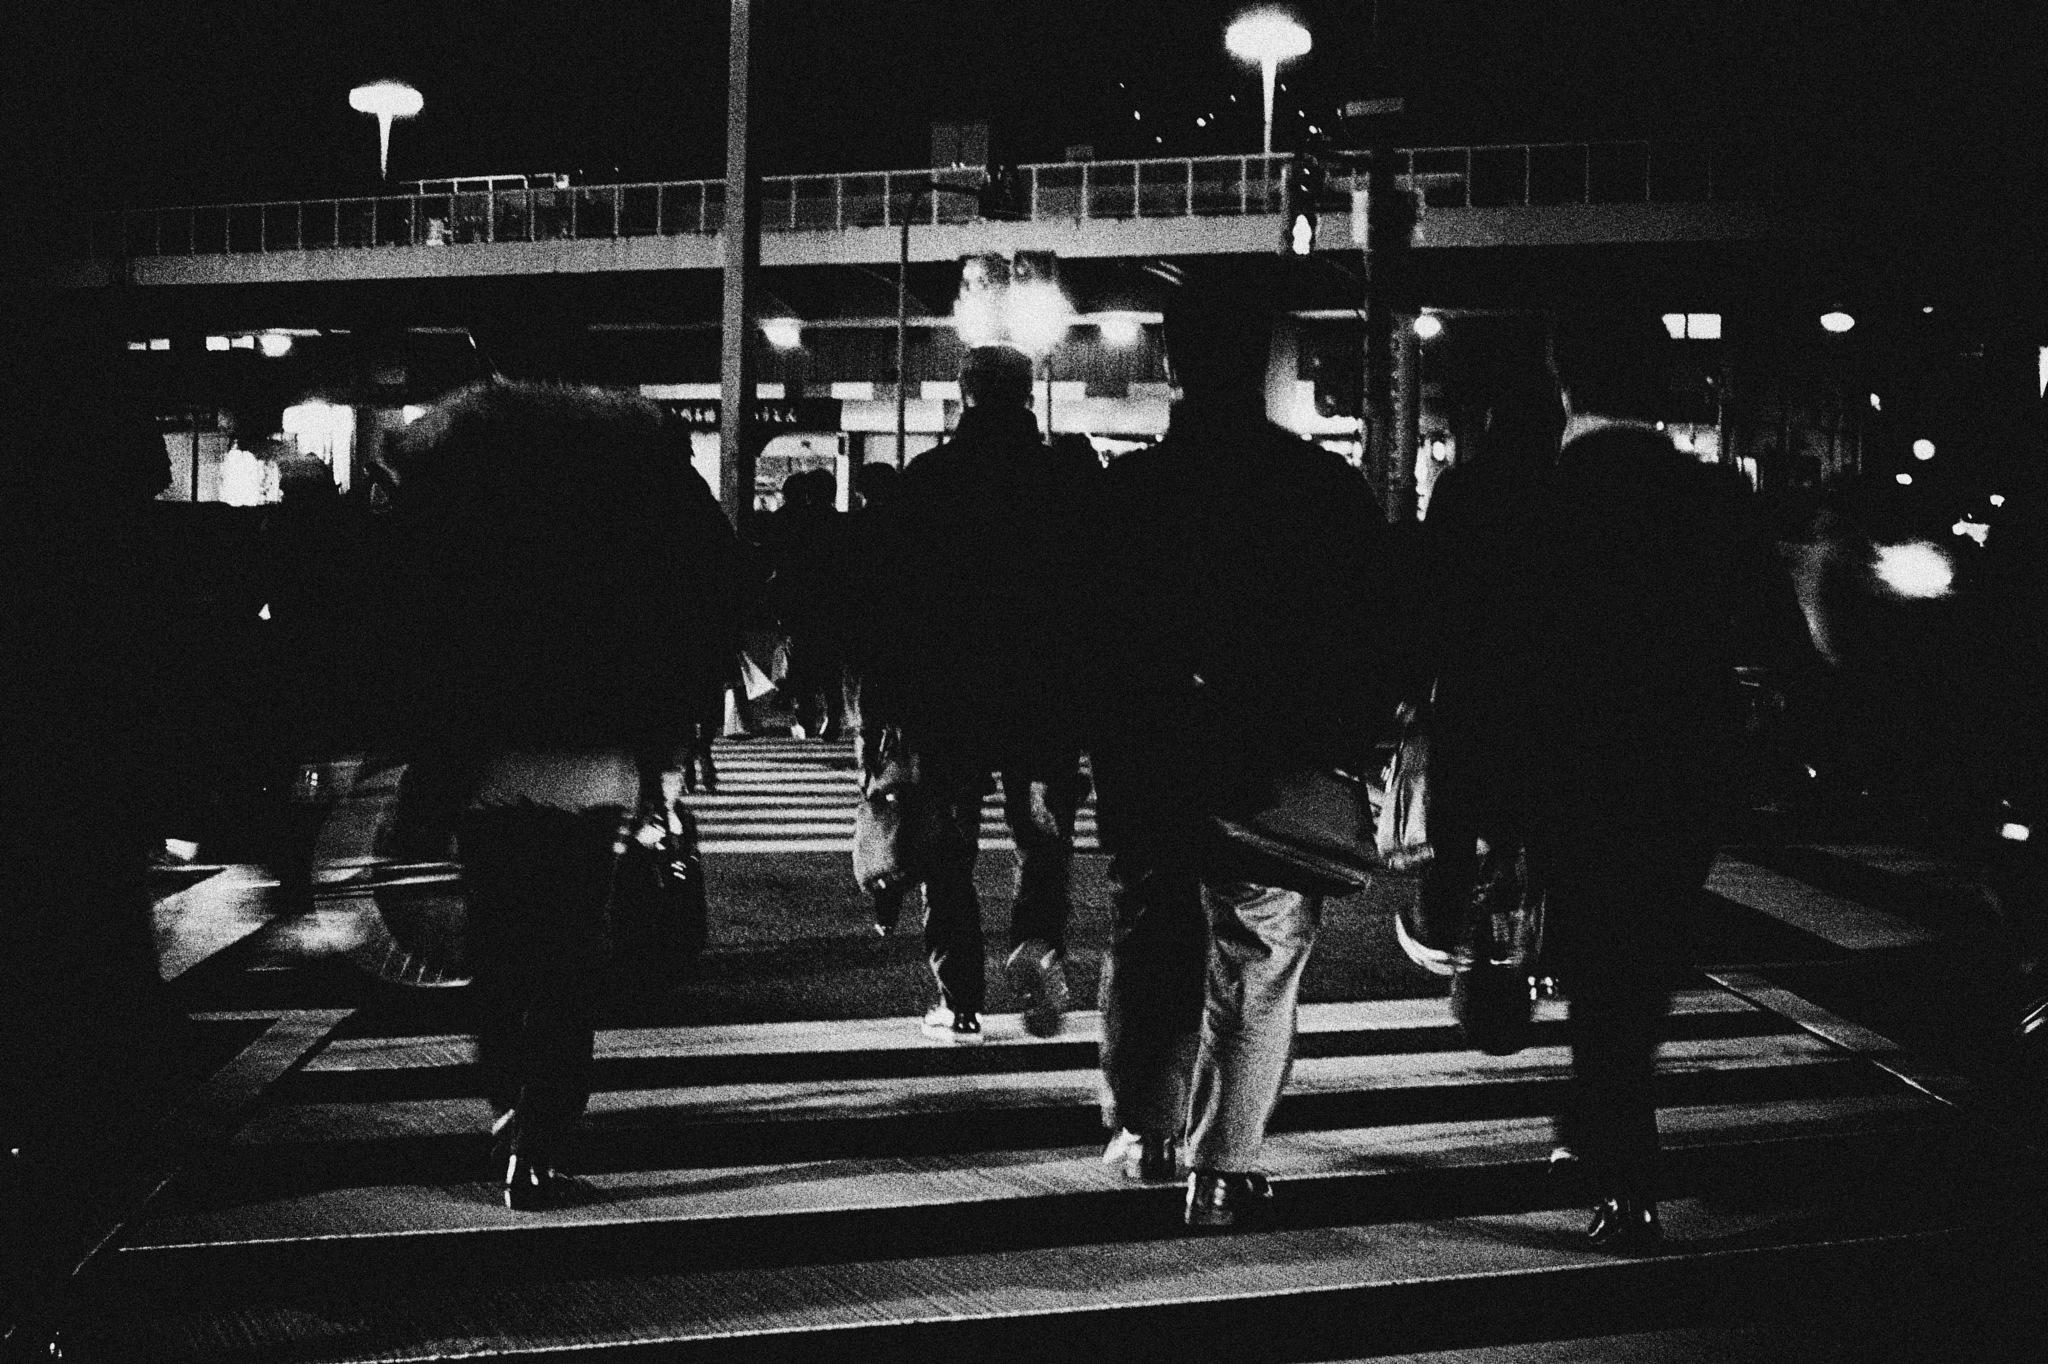 On the way home by Hitoshi Matsumoto